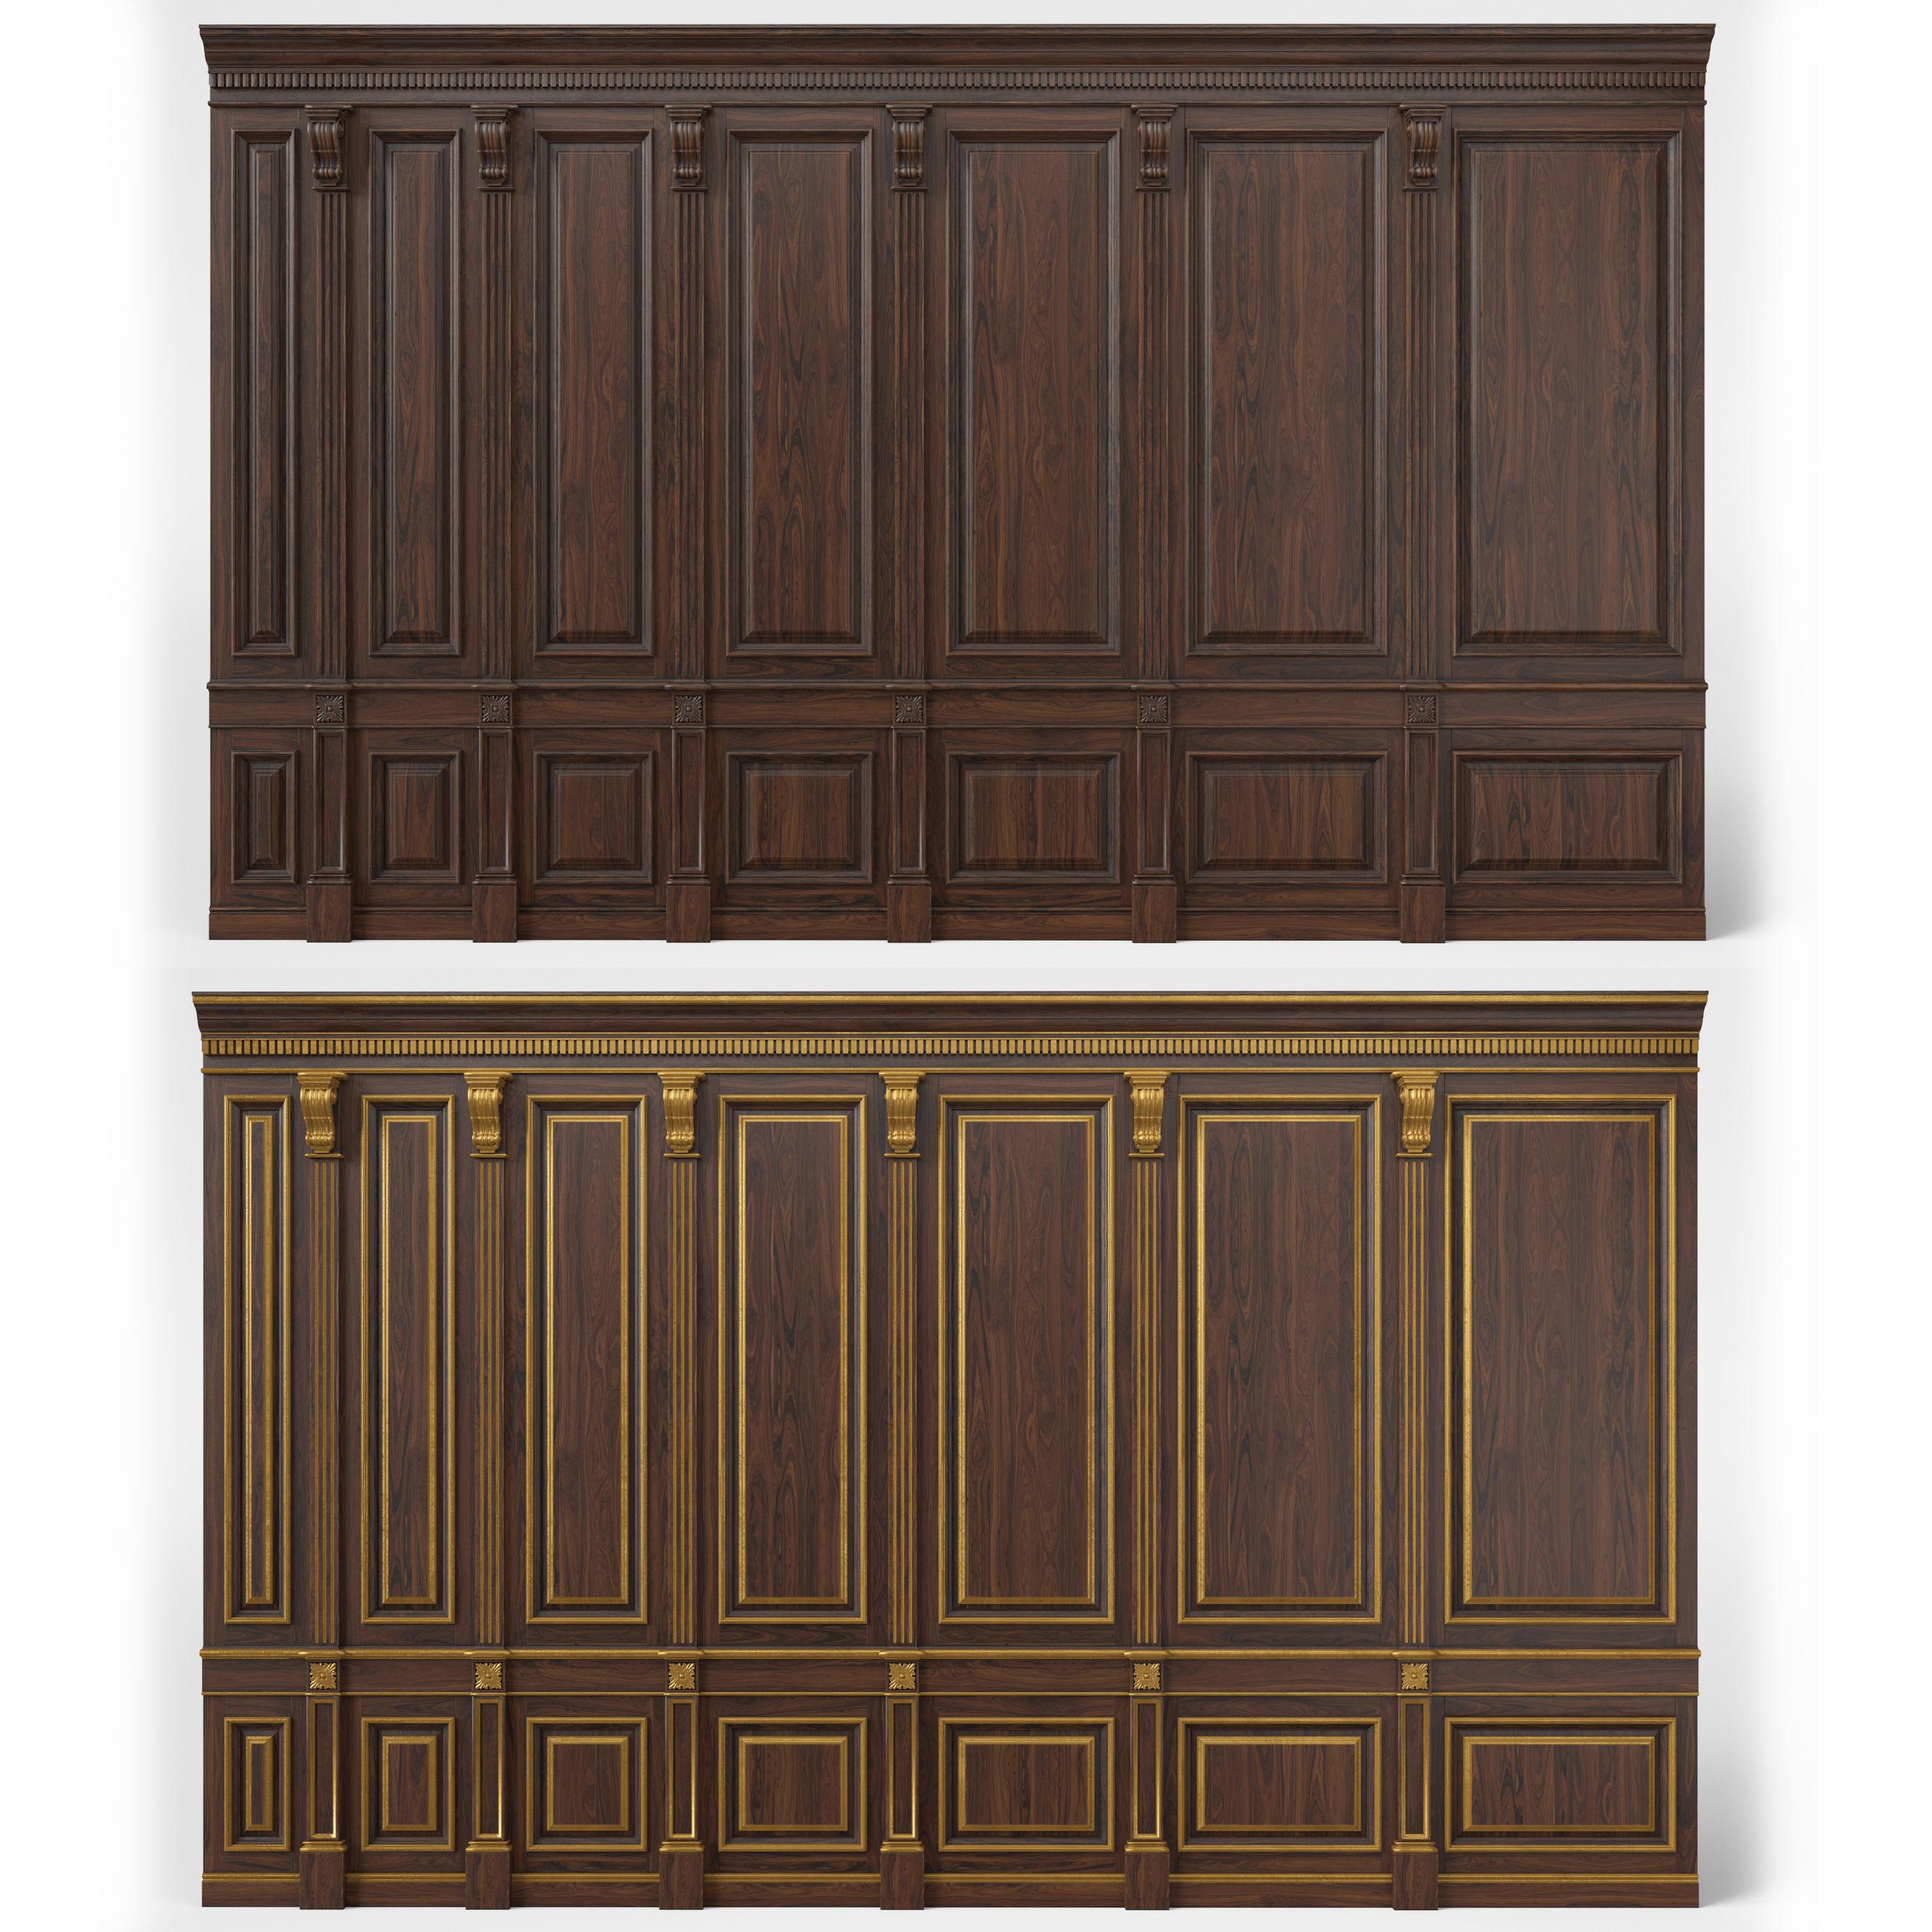 wooden panel 02 07